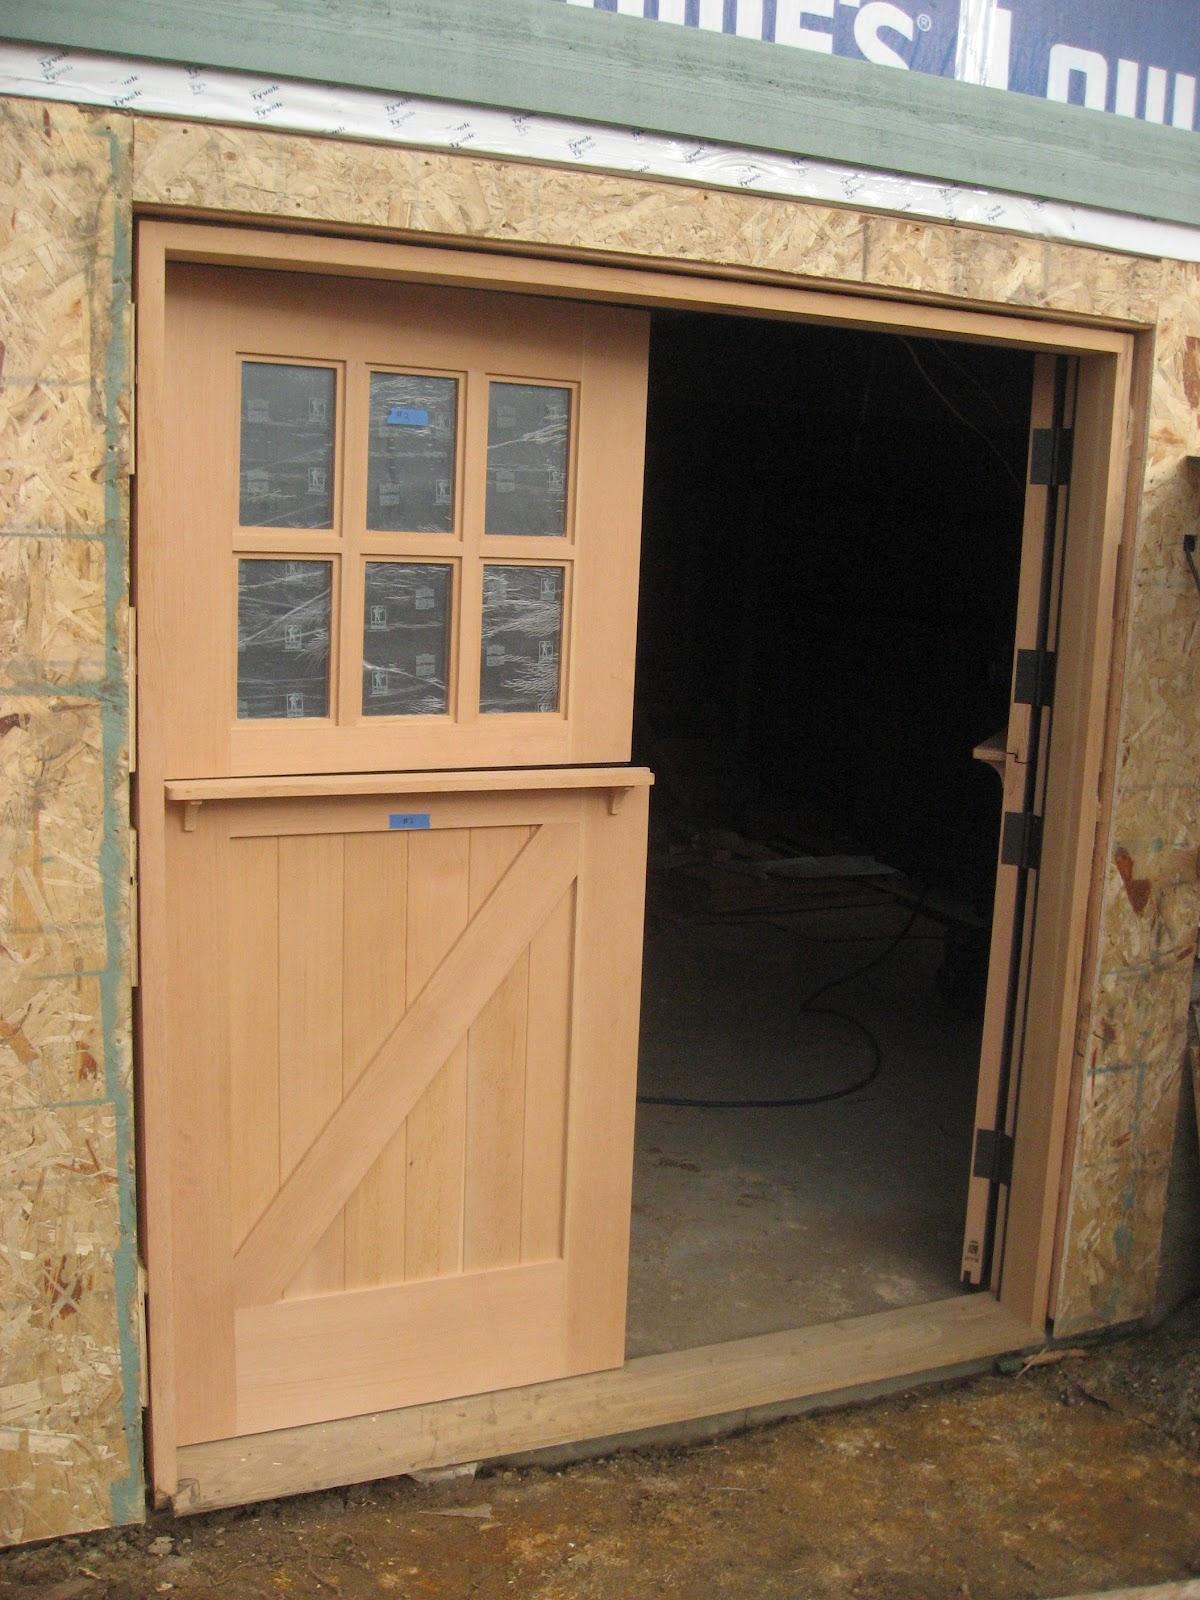 org handballtunisie stupendous door interior l basement ideas doors glass